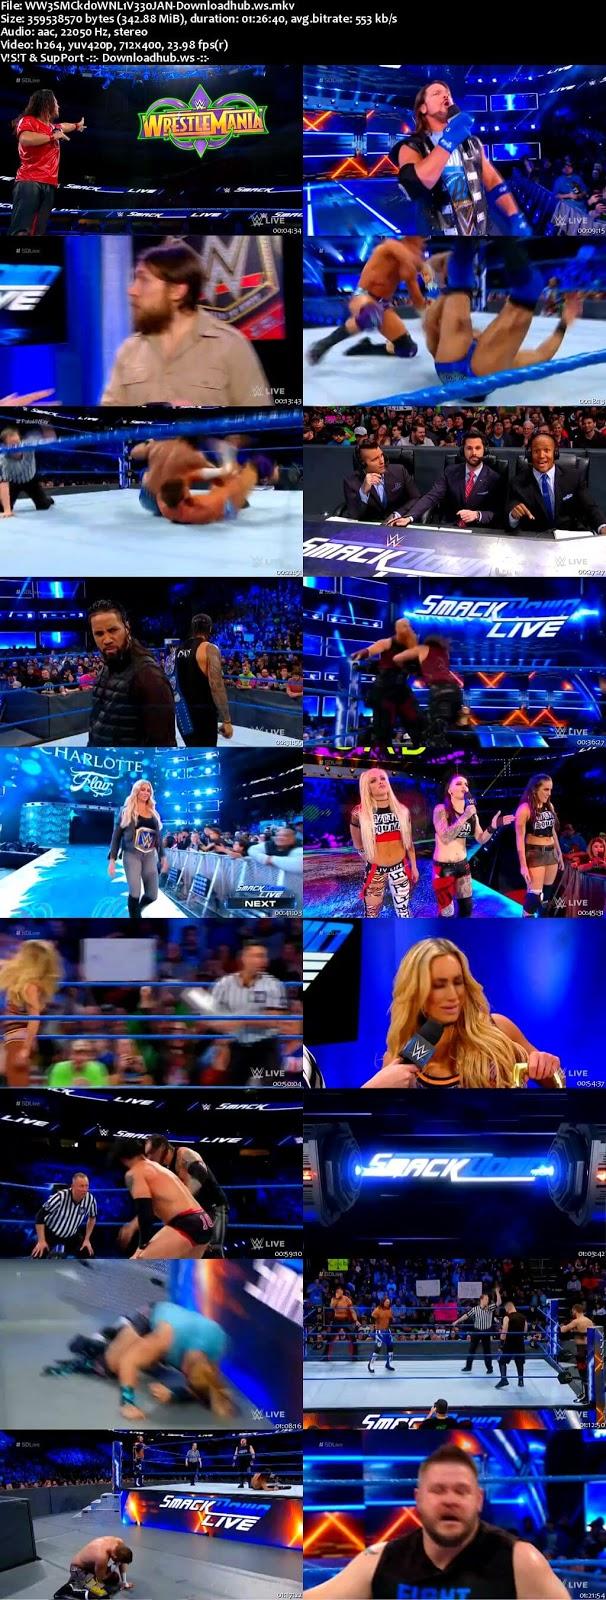 WWE Smackdown Live 30 January 2018 480p HDTV